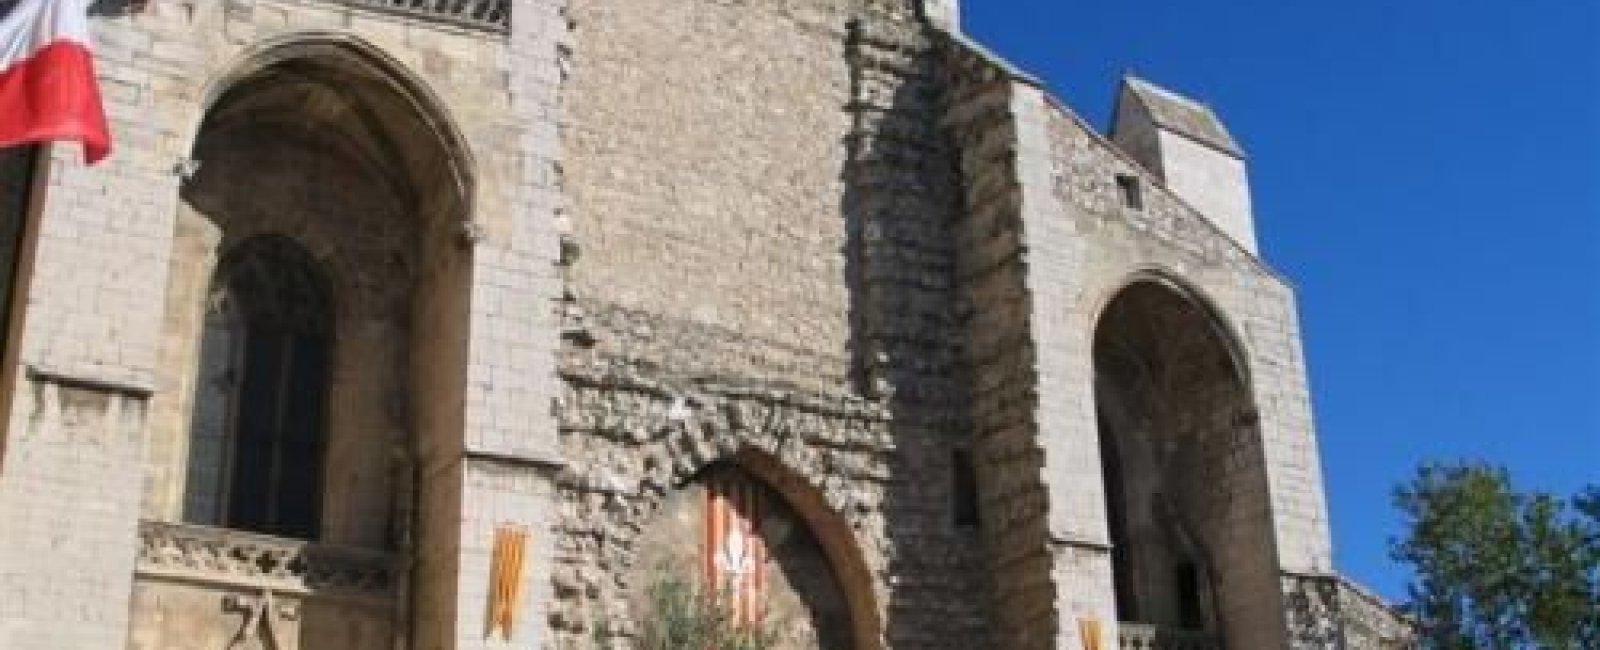 Basilique Sainte Marie-Madeleine - Saint Maximin la Sainte Baume